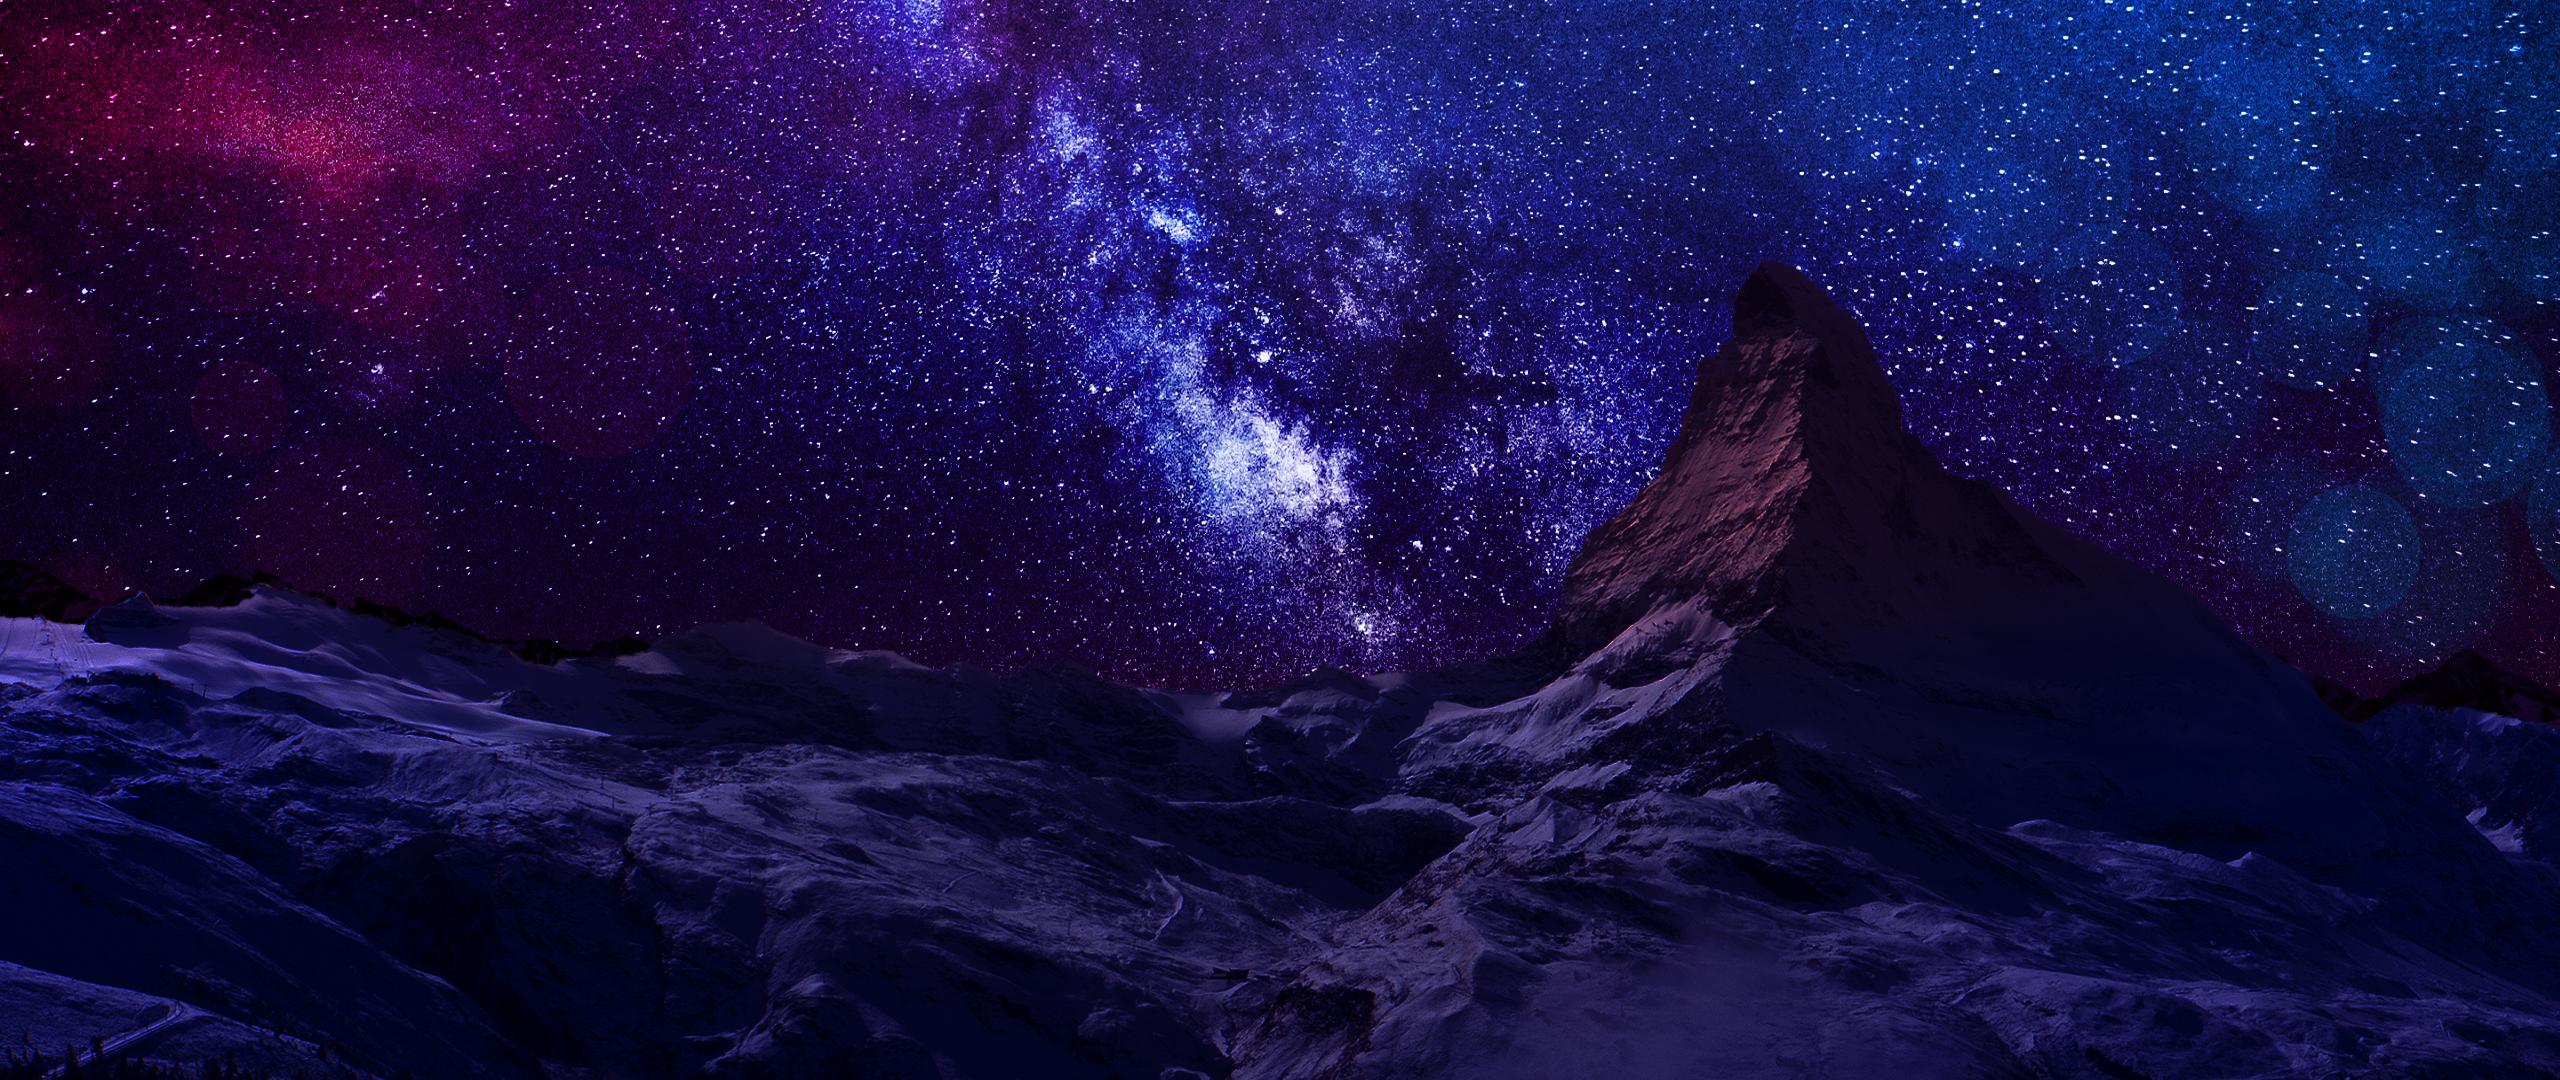 Purple star png hd transparent purple star hdg images pluspng dnyadoa gkyz hill snow mavi pink da gece star yldzlar mor duvarkad altavistaventures Images